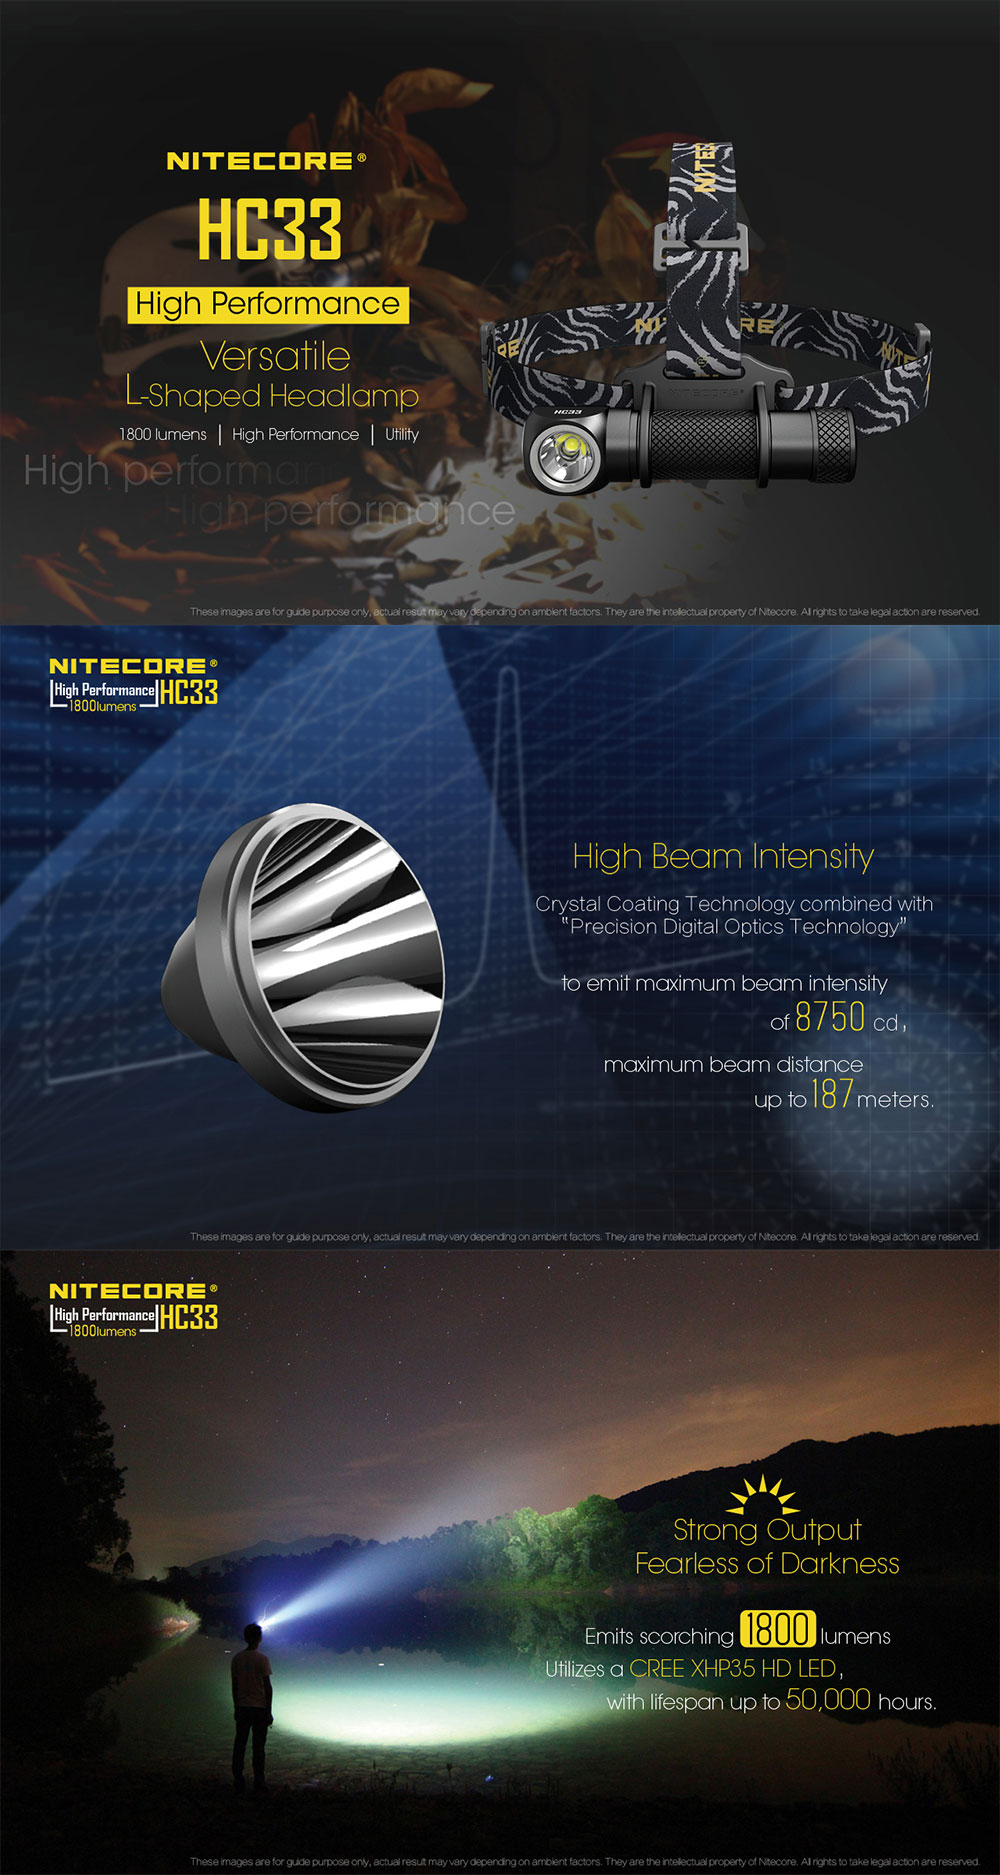 nitecore hc33 headlight